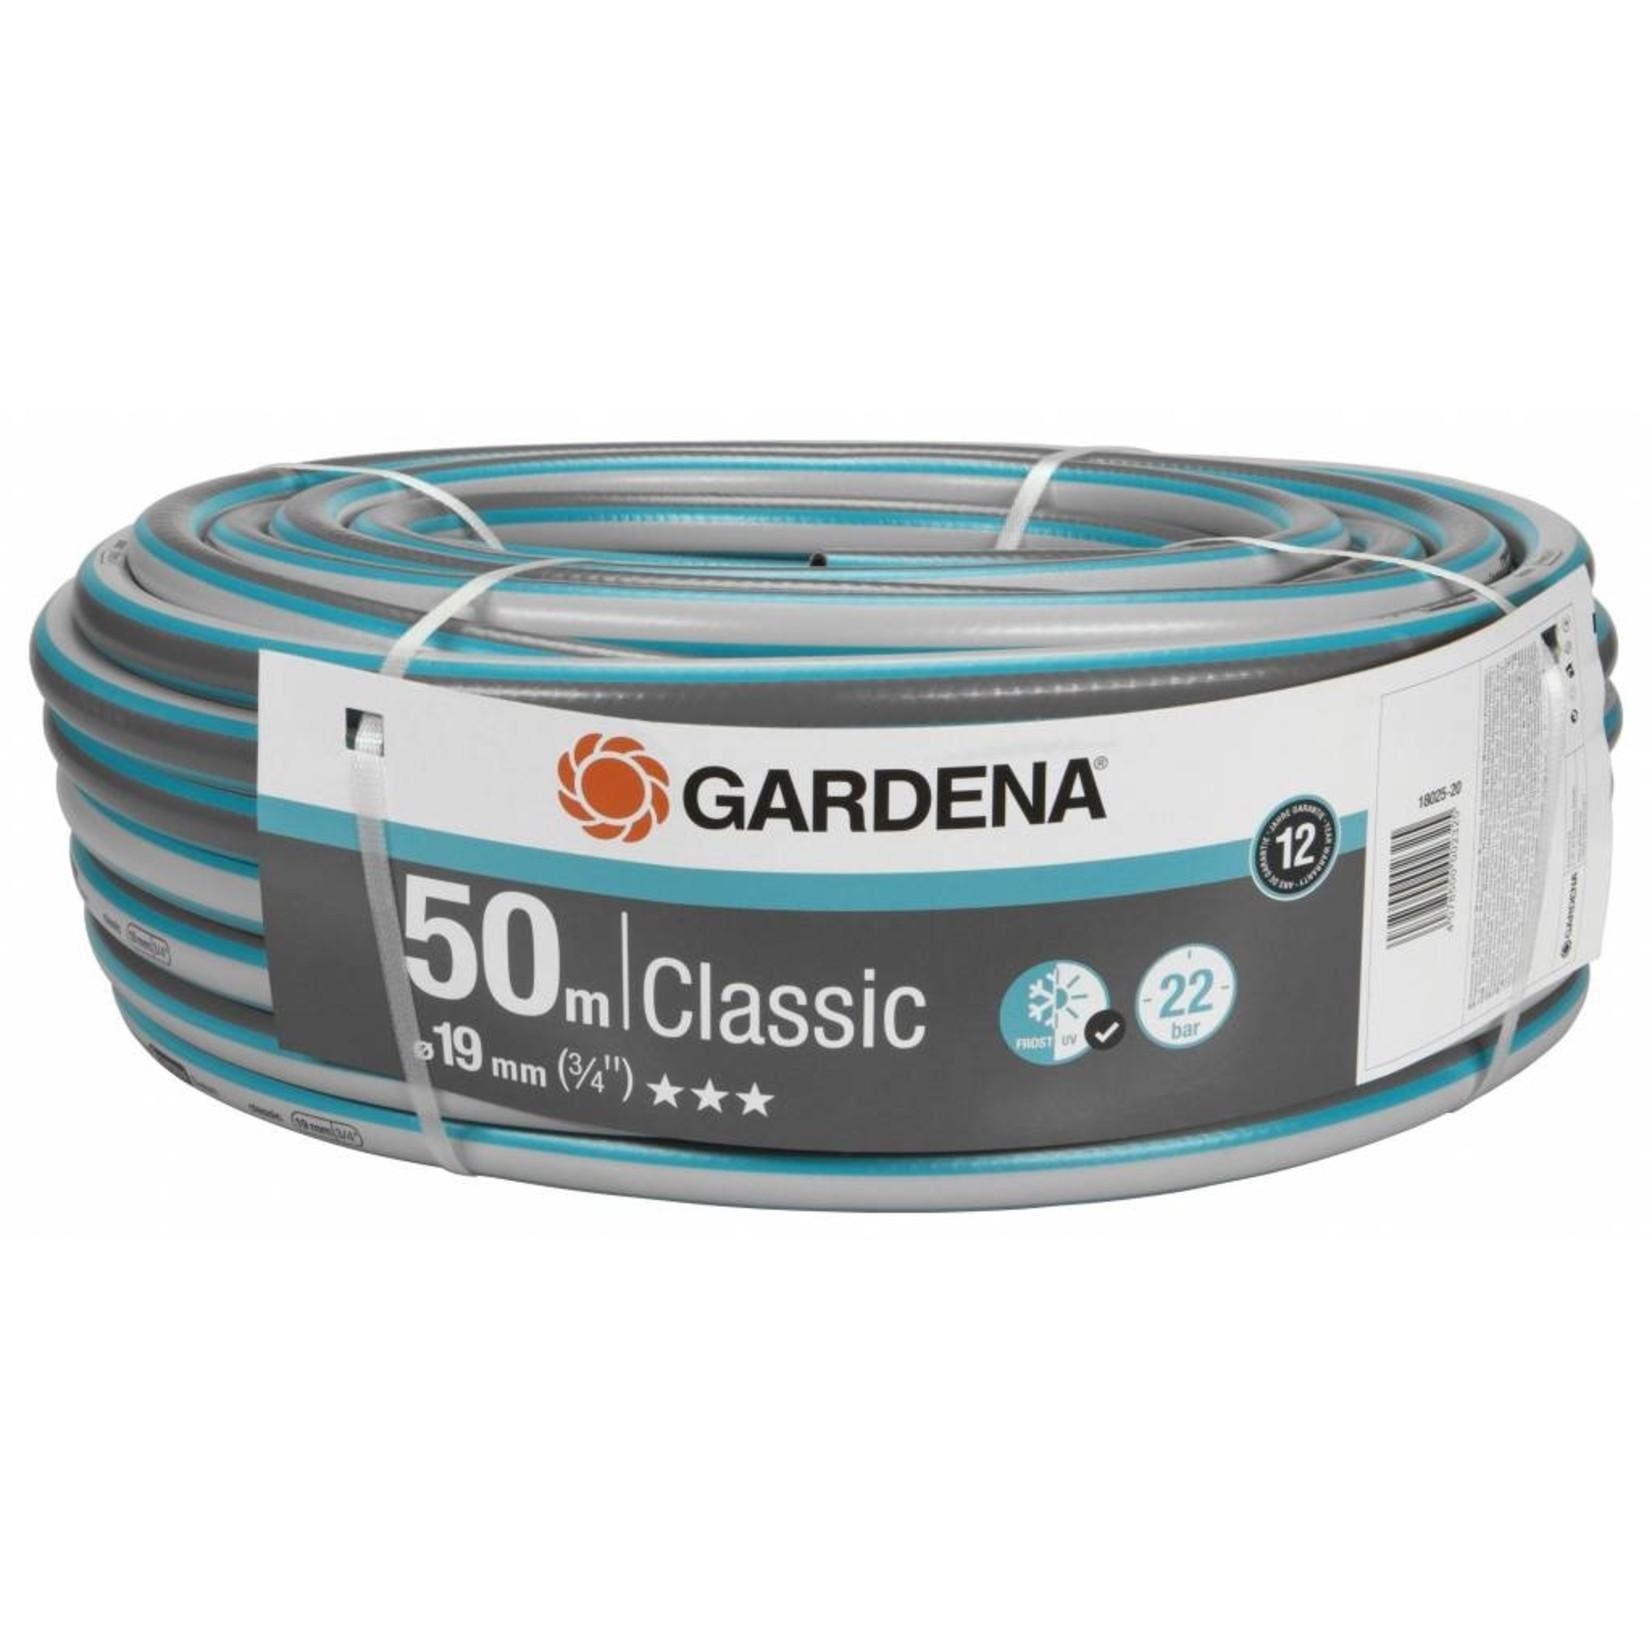 Gardena Gardena Classic slang 50m/19 mm